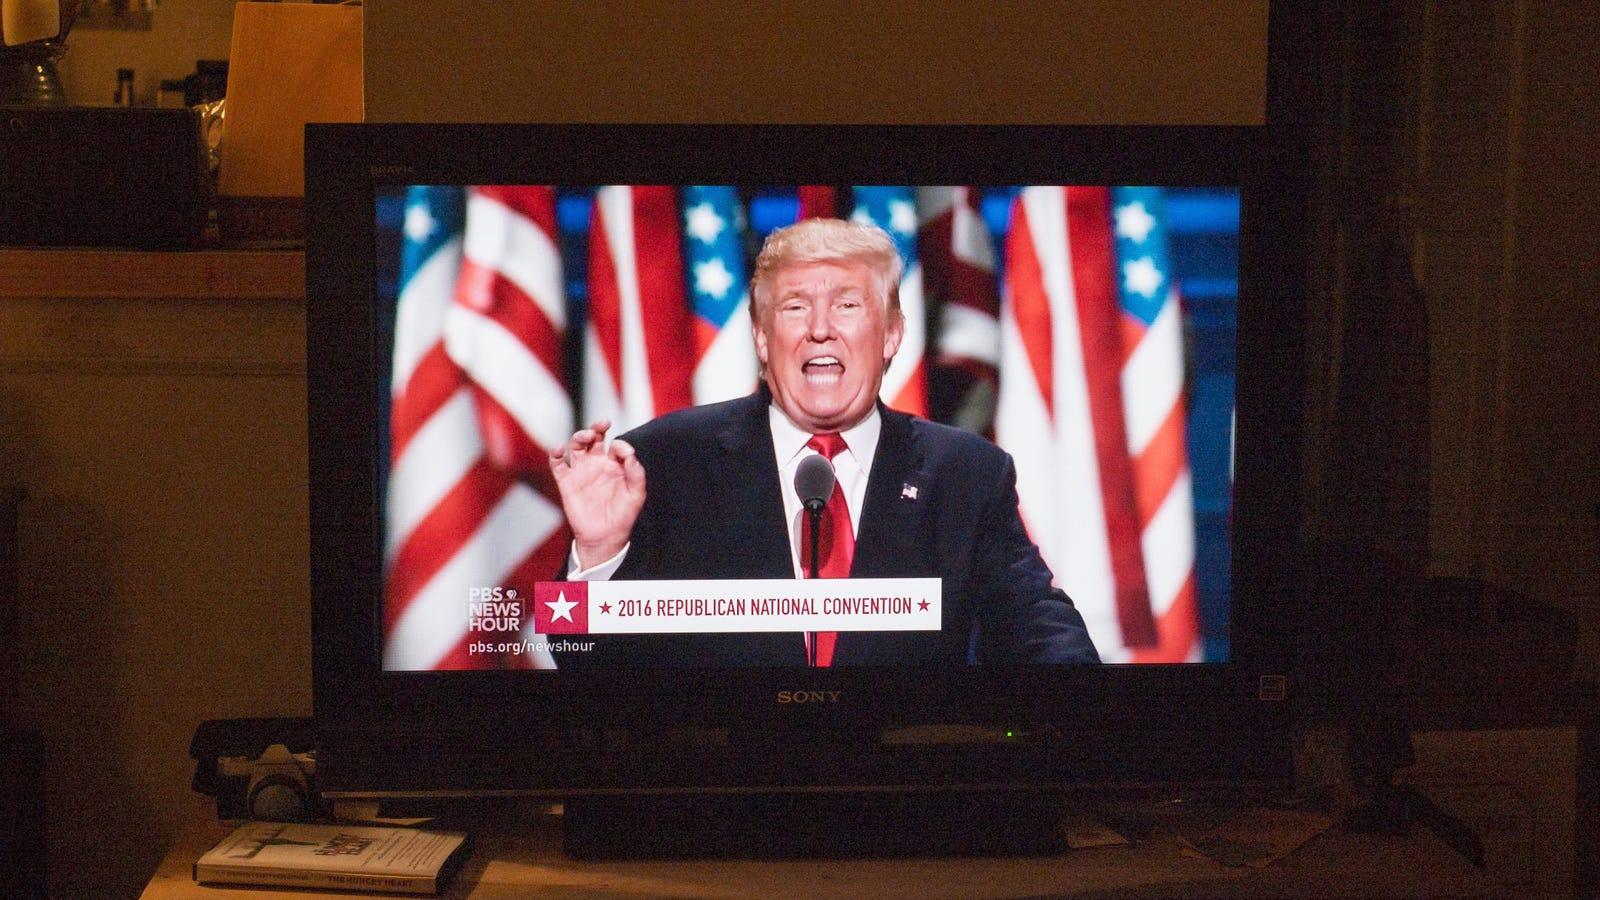 Hasil gambar untuk donald trump on tv